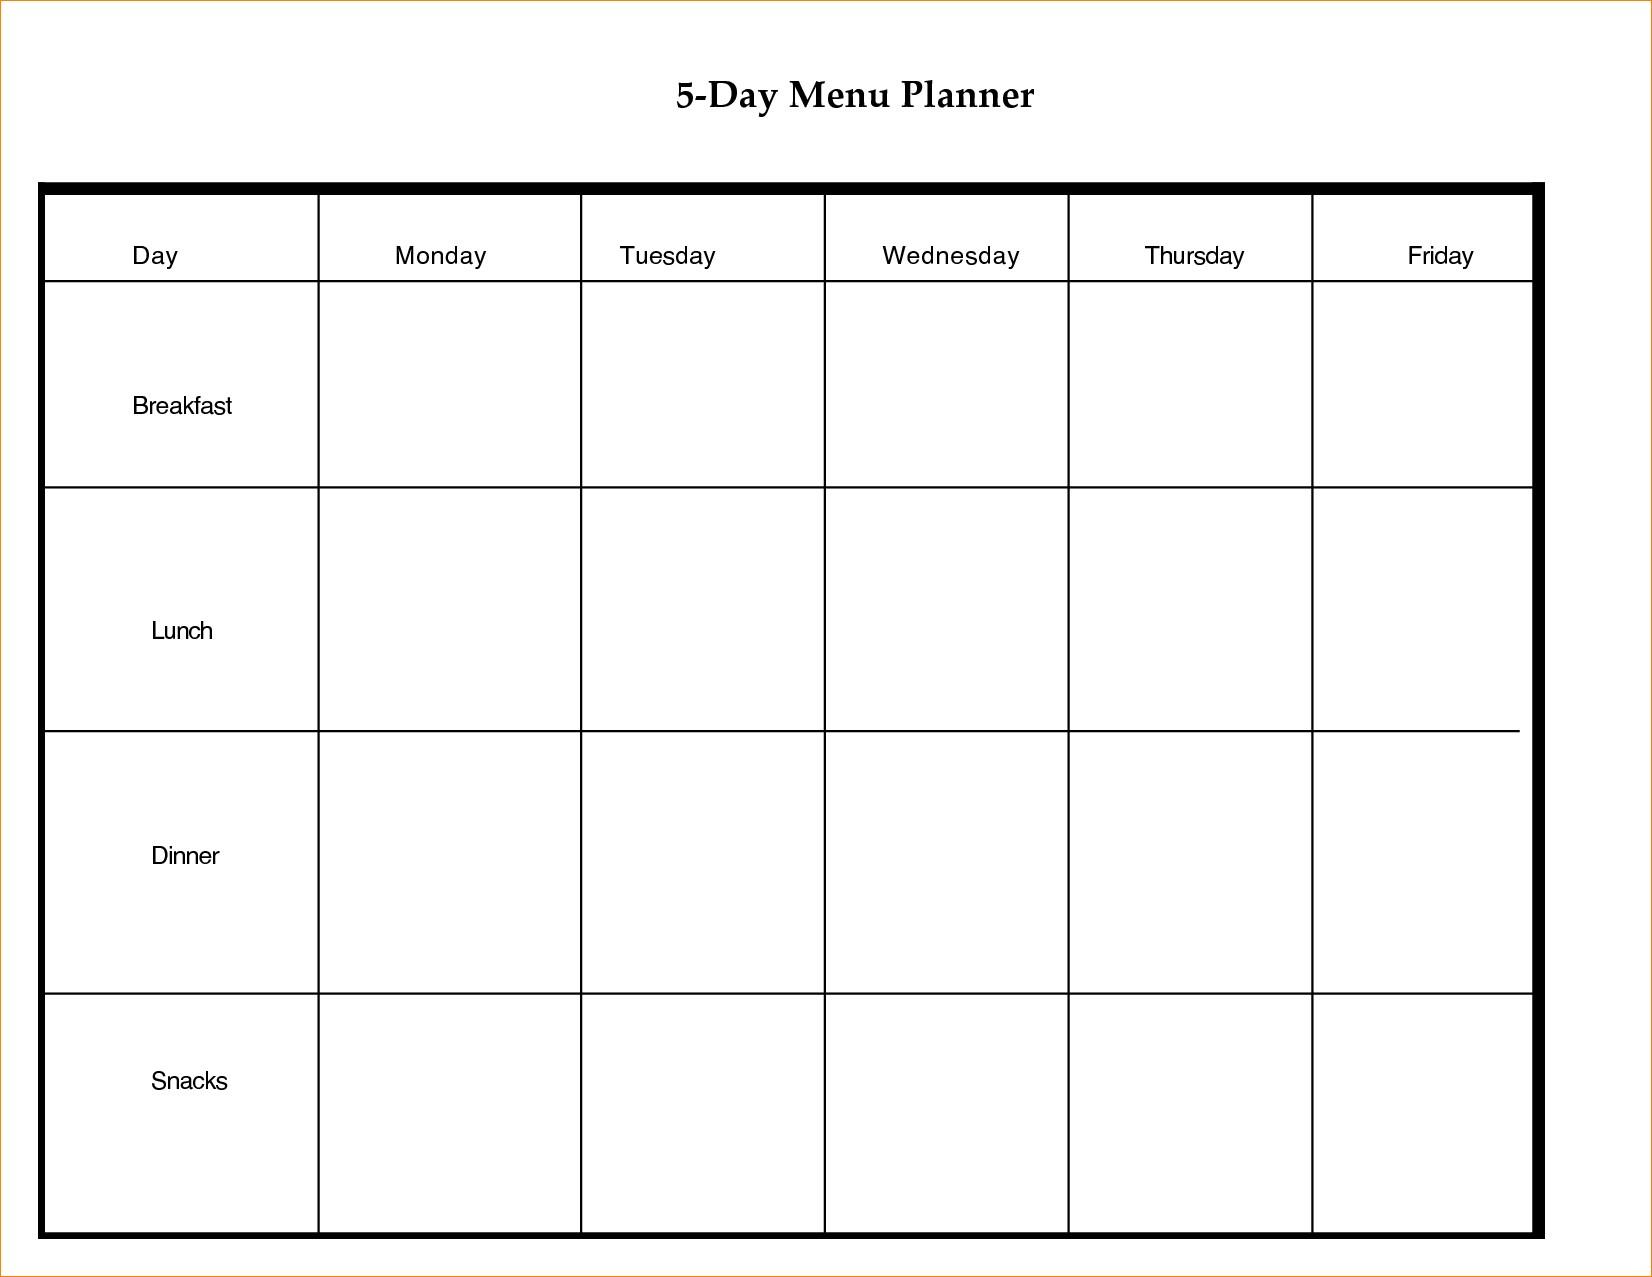 015 Template Ideas Weekly Calendar Incredible Blank 2018-19 2019 pertaining to Blank Printable Weekly Calendar